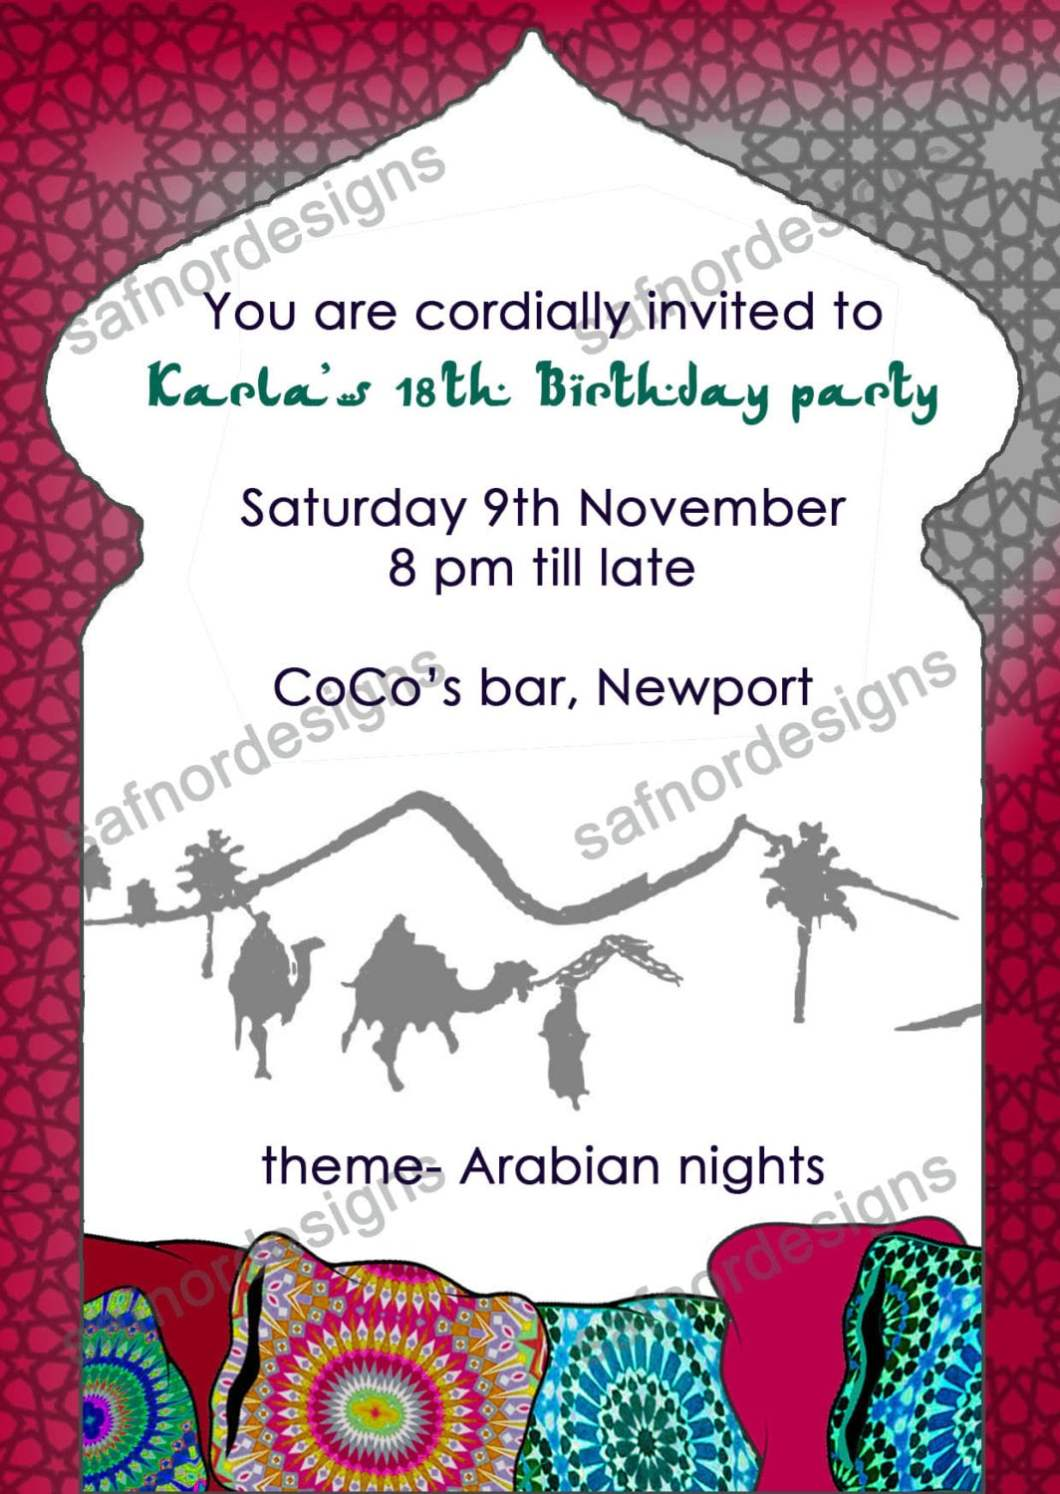 Birthday Invitation In Arabic | Invitationjdi.co